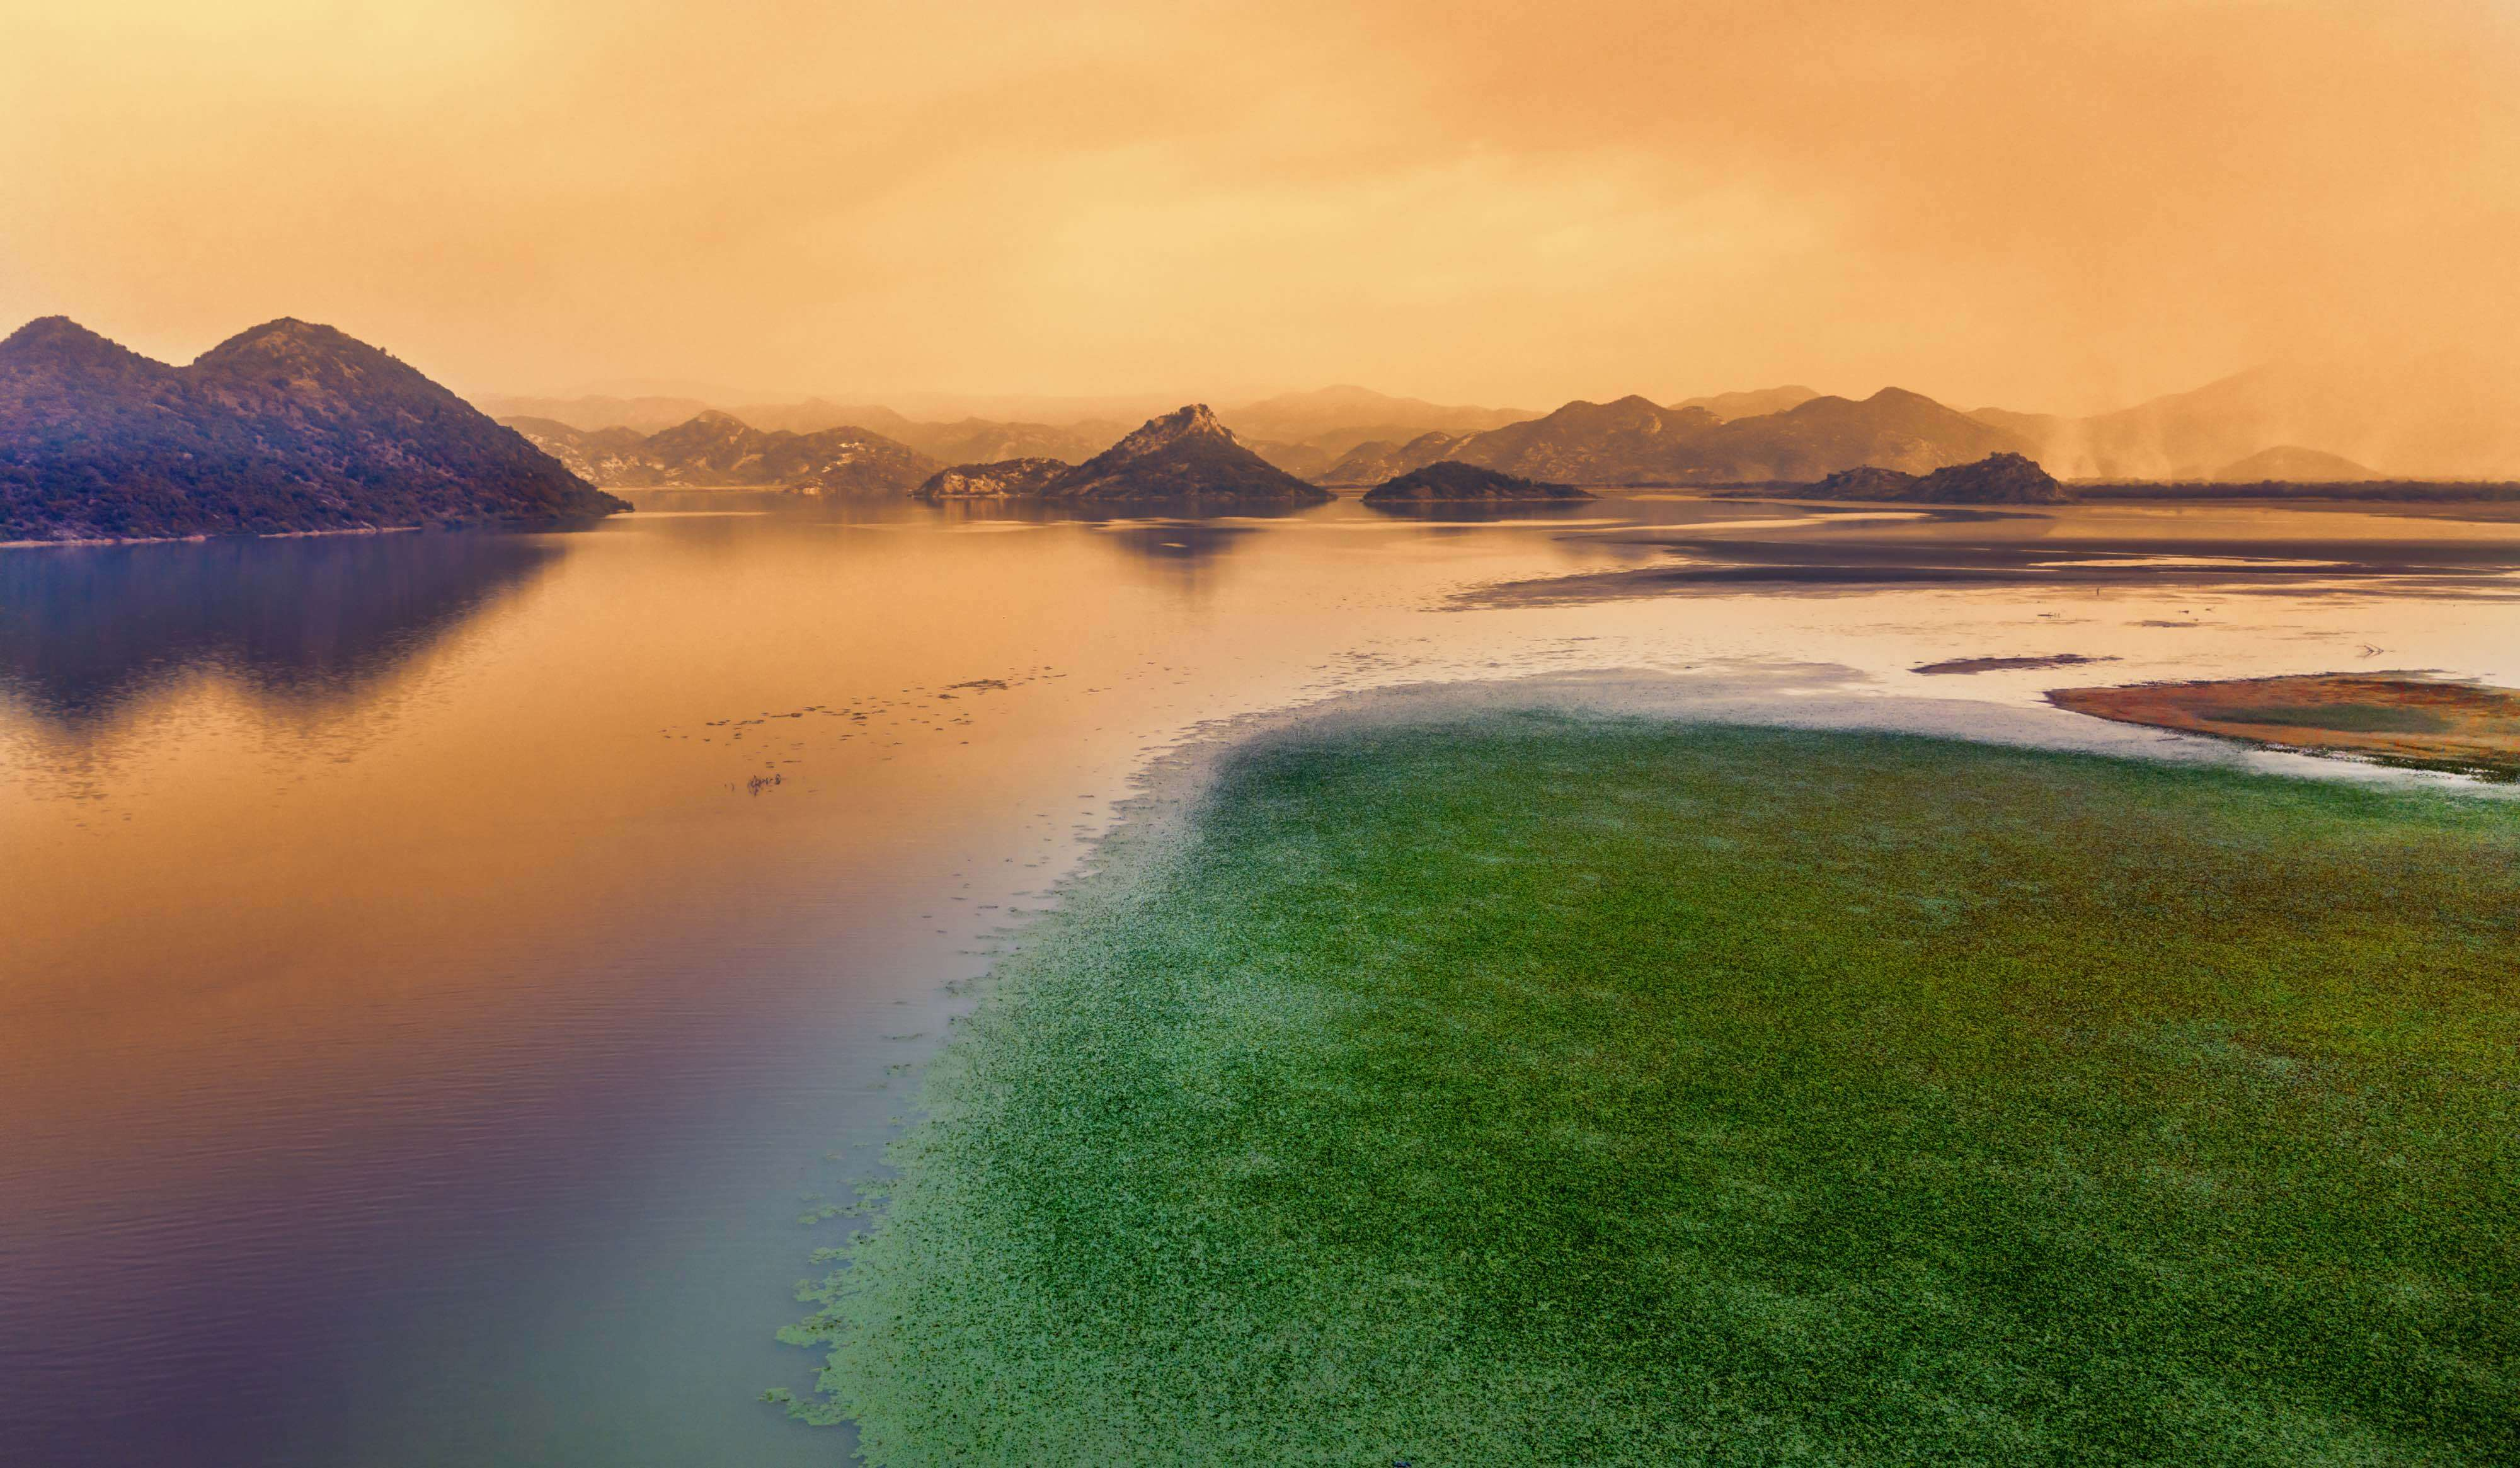 Sunset at the prime bride-watching destination of Skadar Lake.